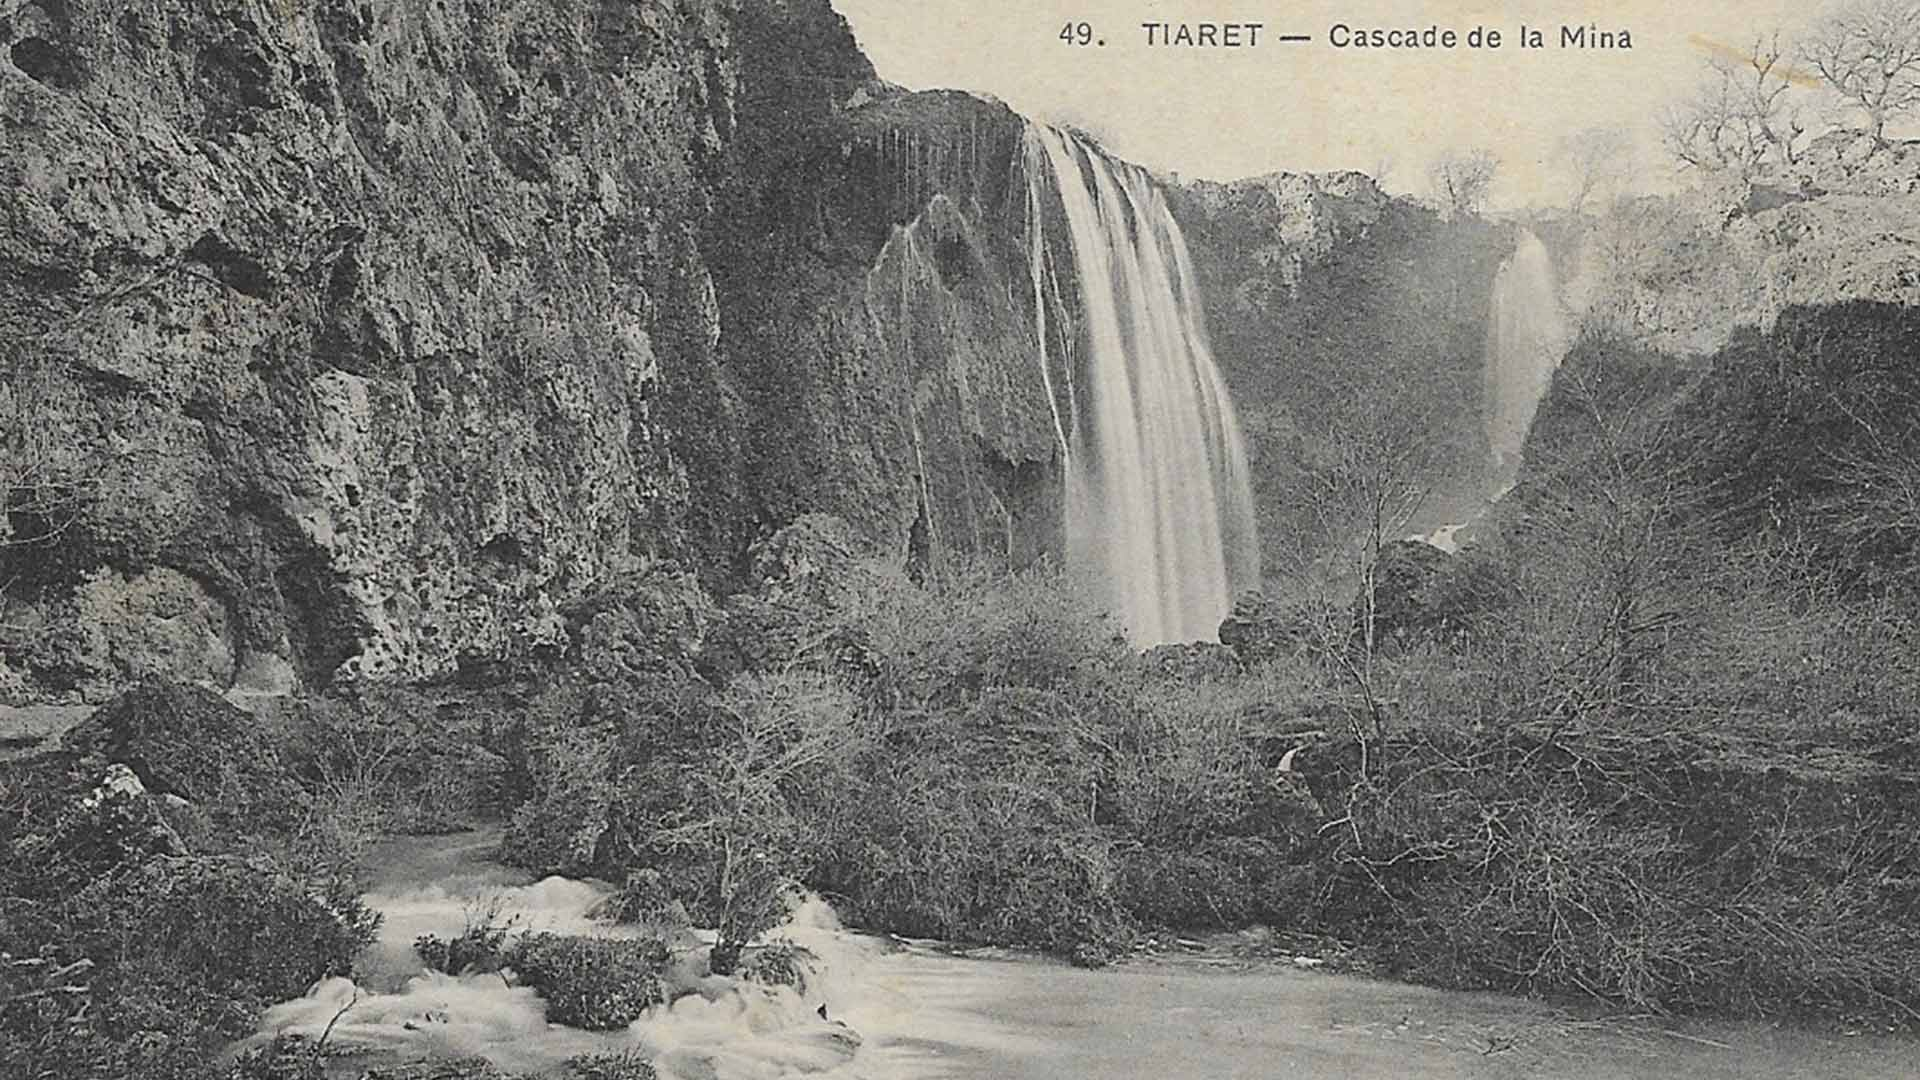 Tiaret-Cascade-de-la-Mina